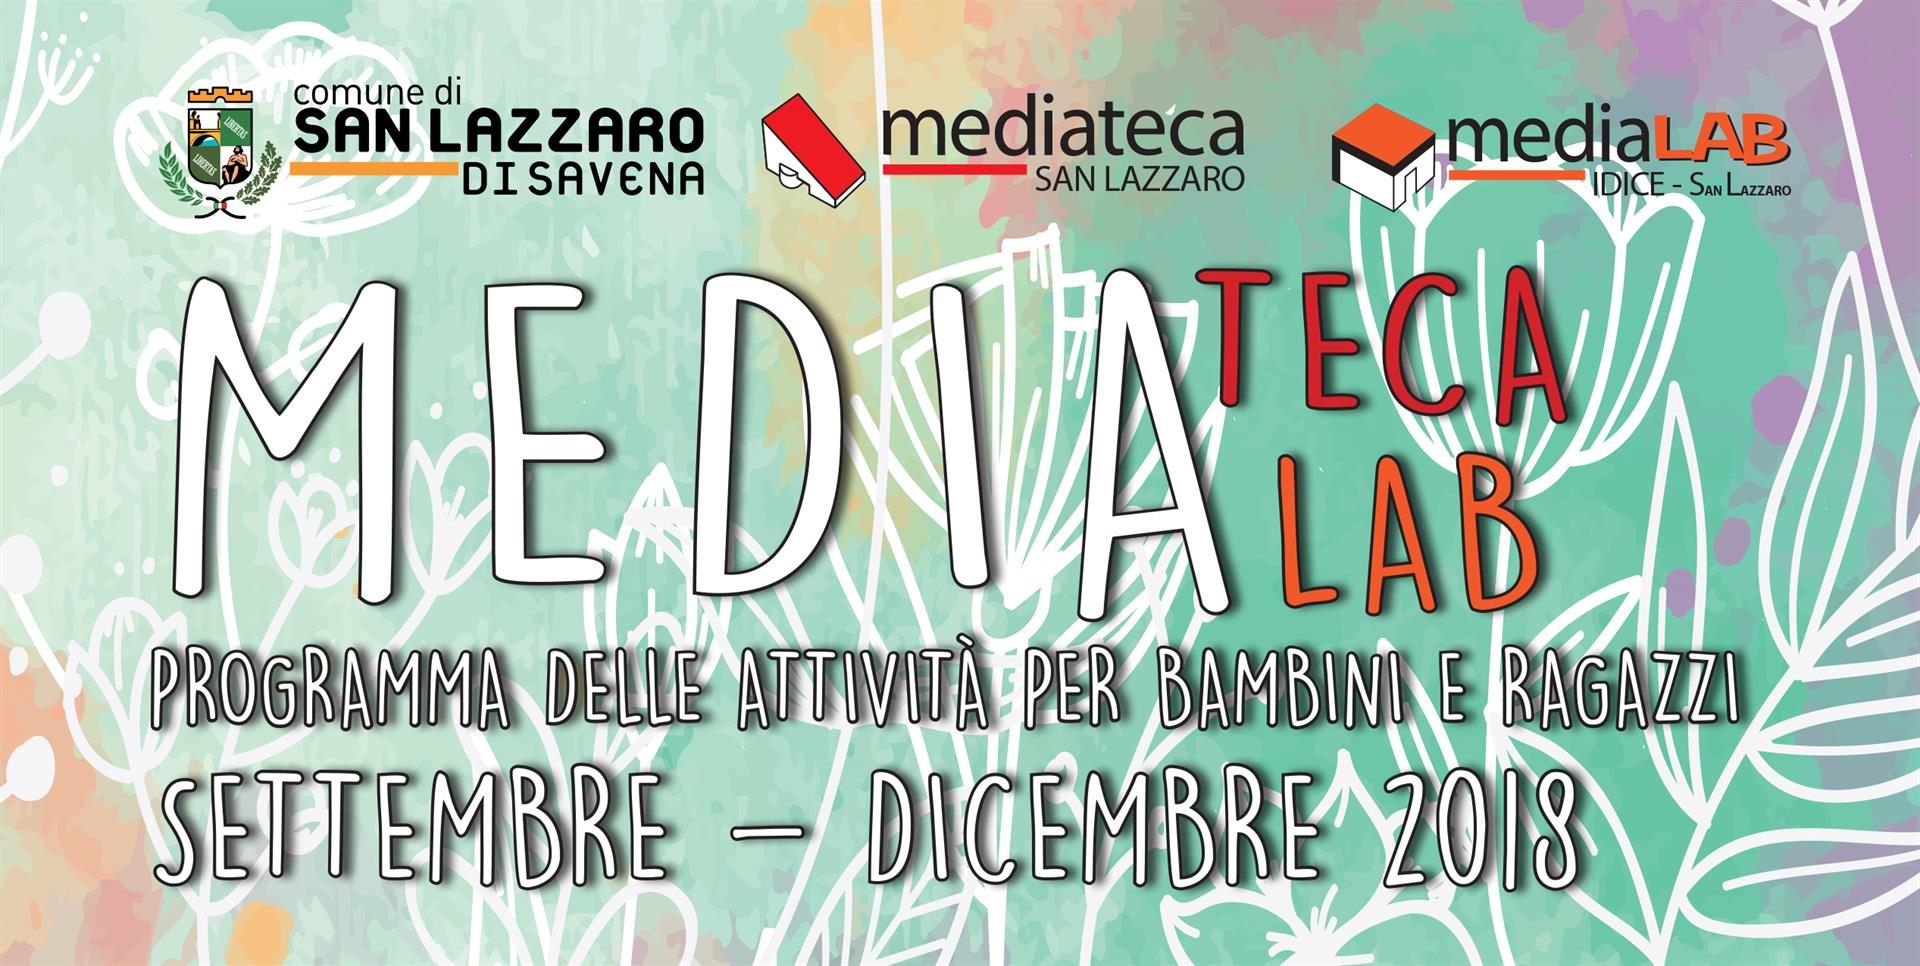 Corsi Mediateca e Medialab Ragazzi sett dic 2018